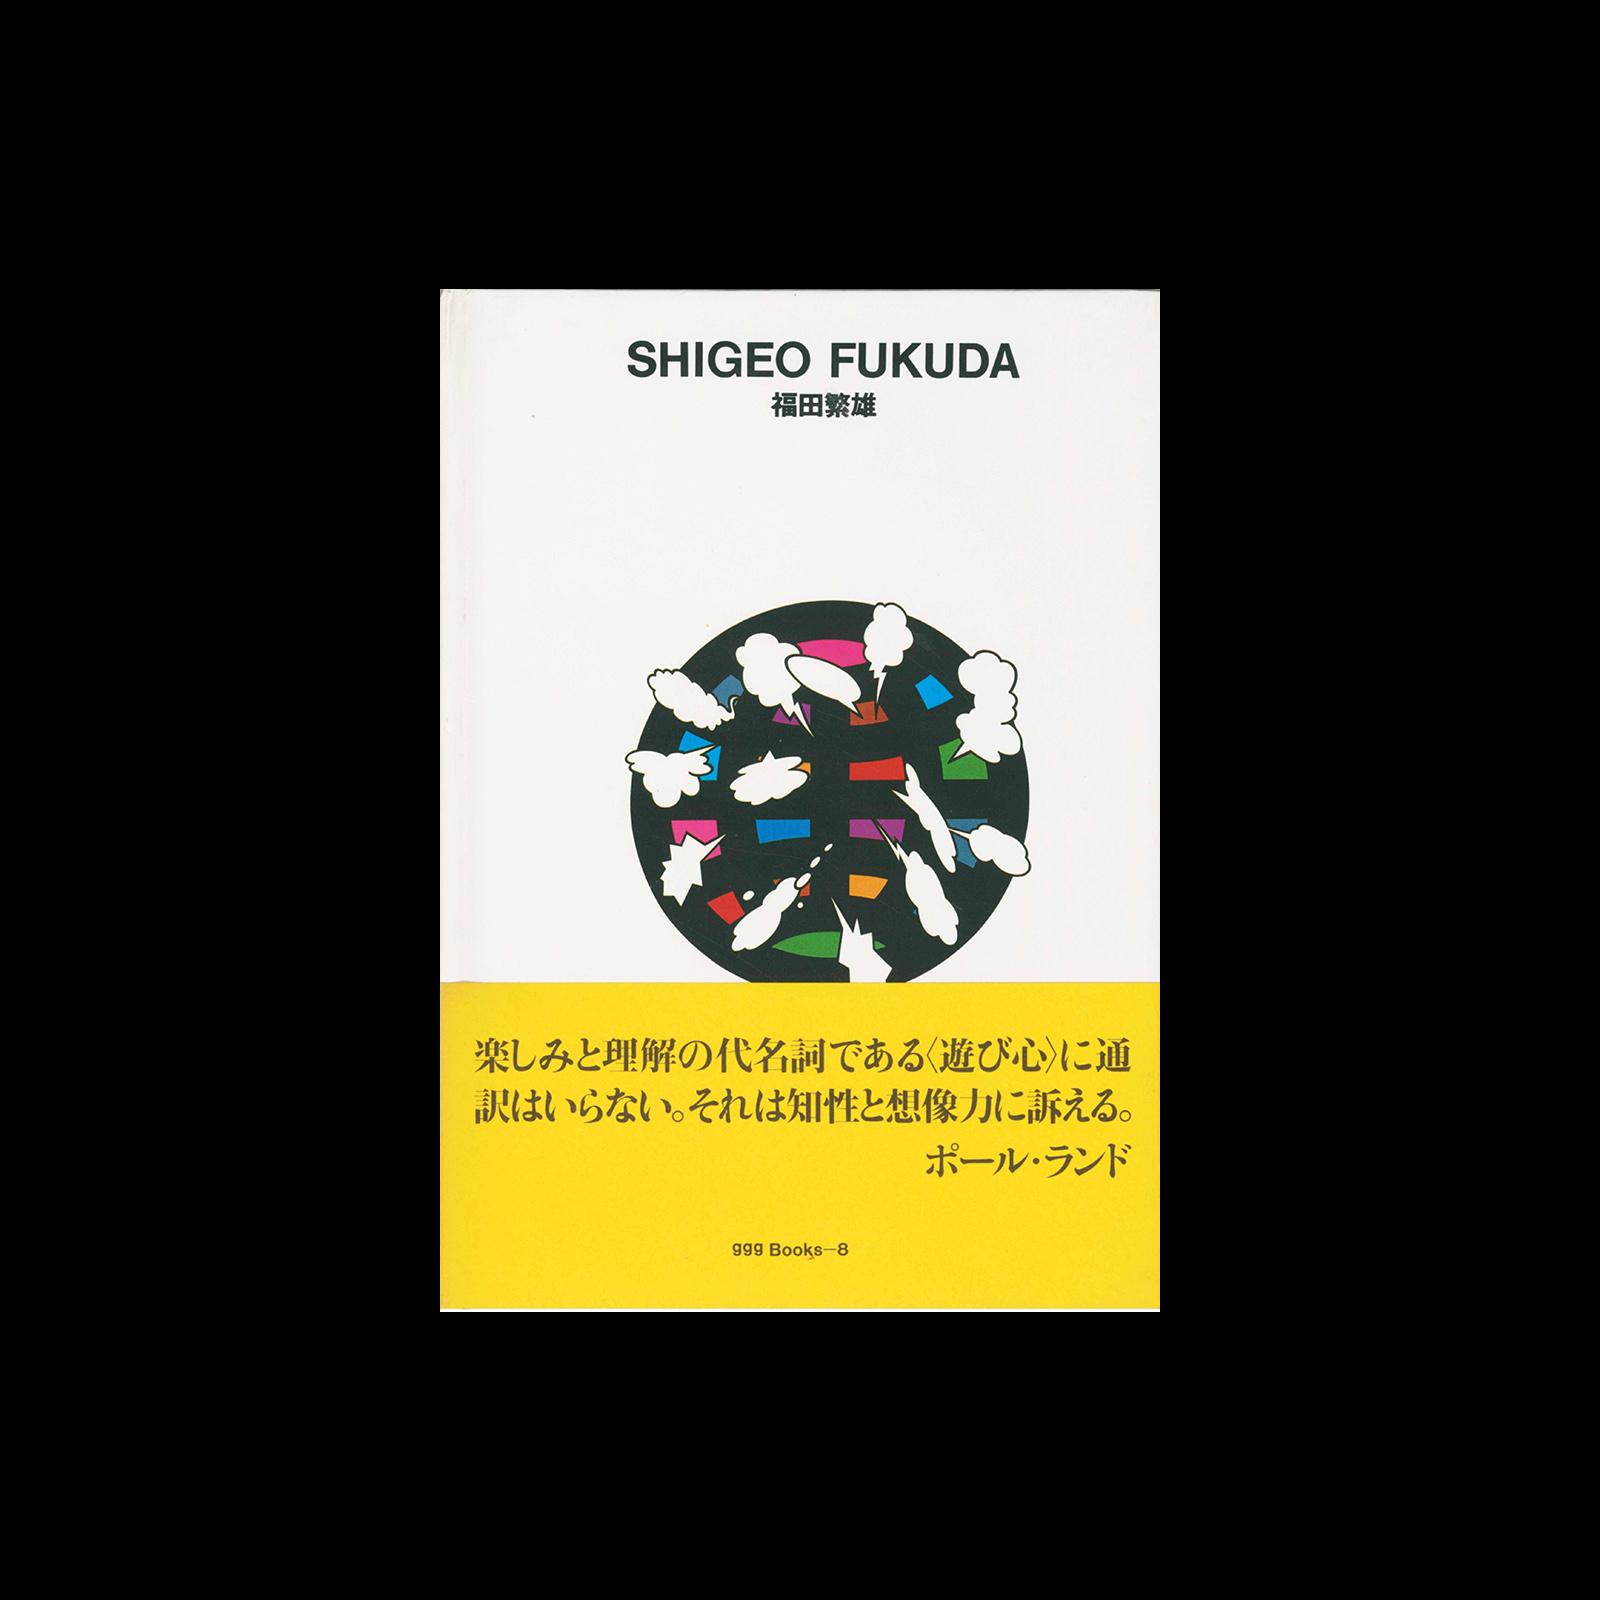 Ginza Graphic Gallery 08, Shigeo Fukuda